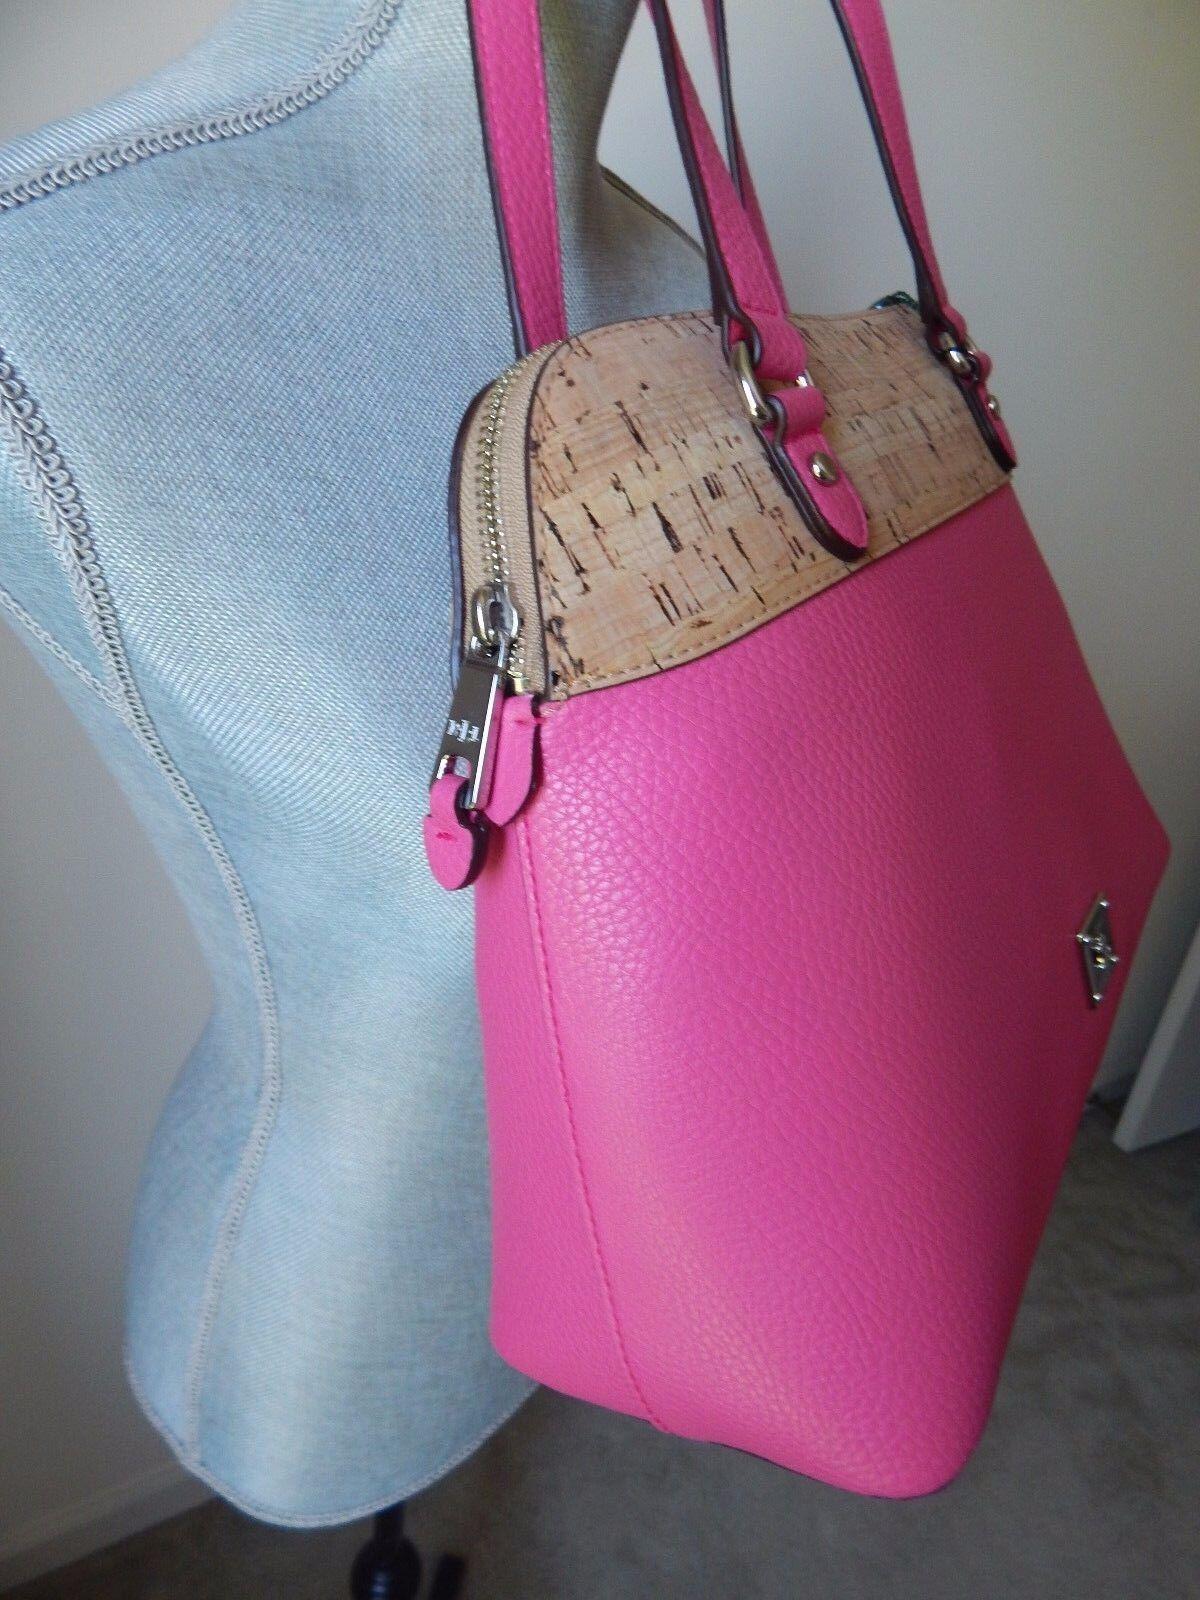 0edaeb87f2 Ralph Lauren Hanway Cork Faux Leather Dome Satchel Light Azalea Pink  Handbag for sale online